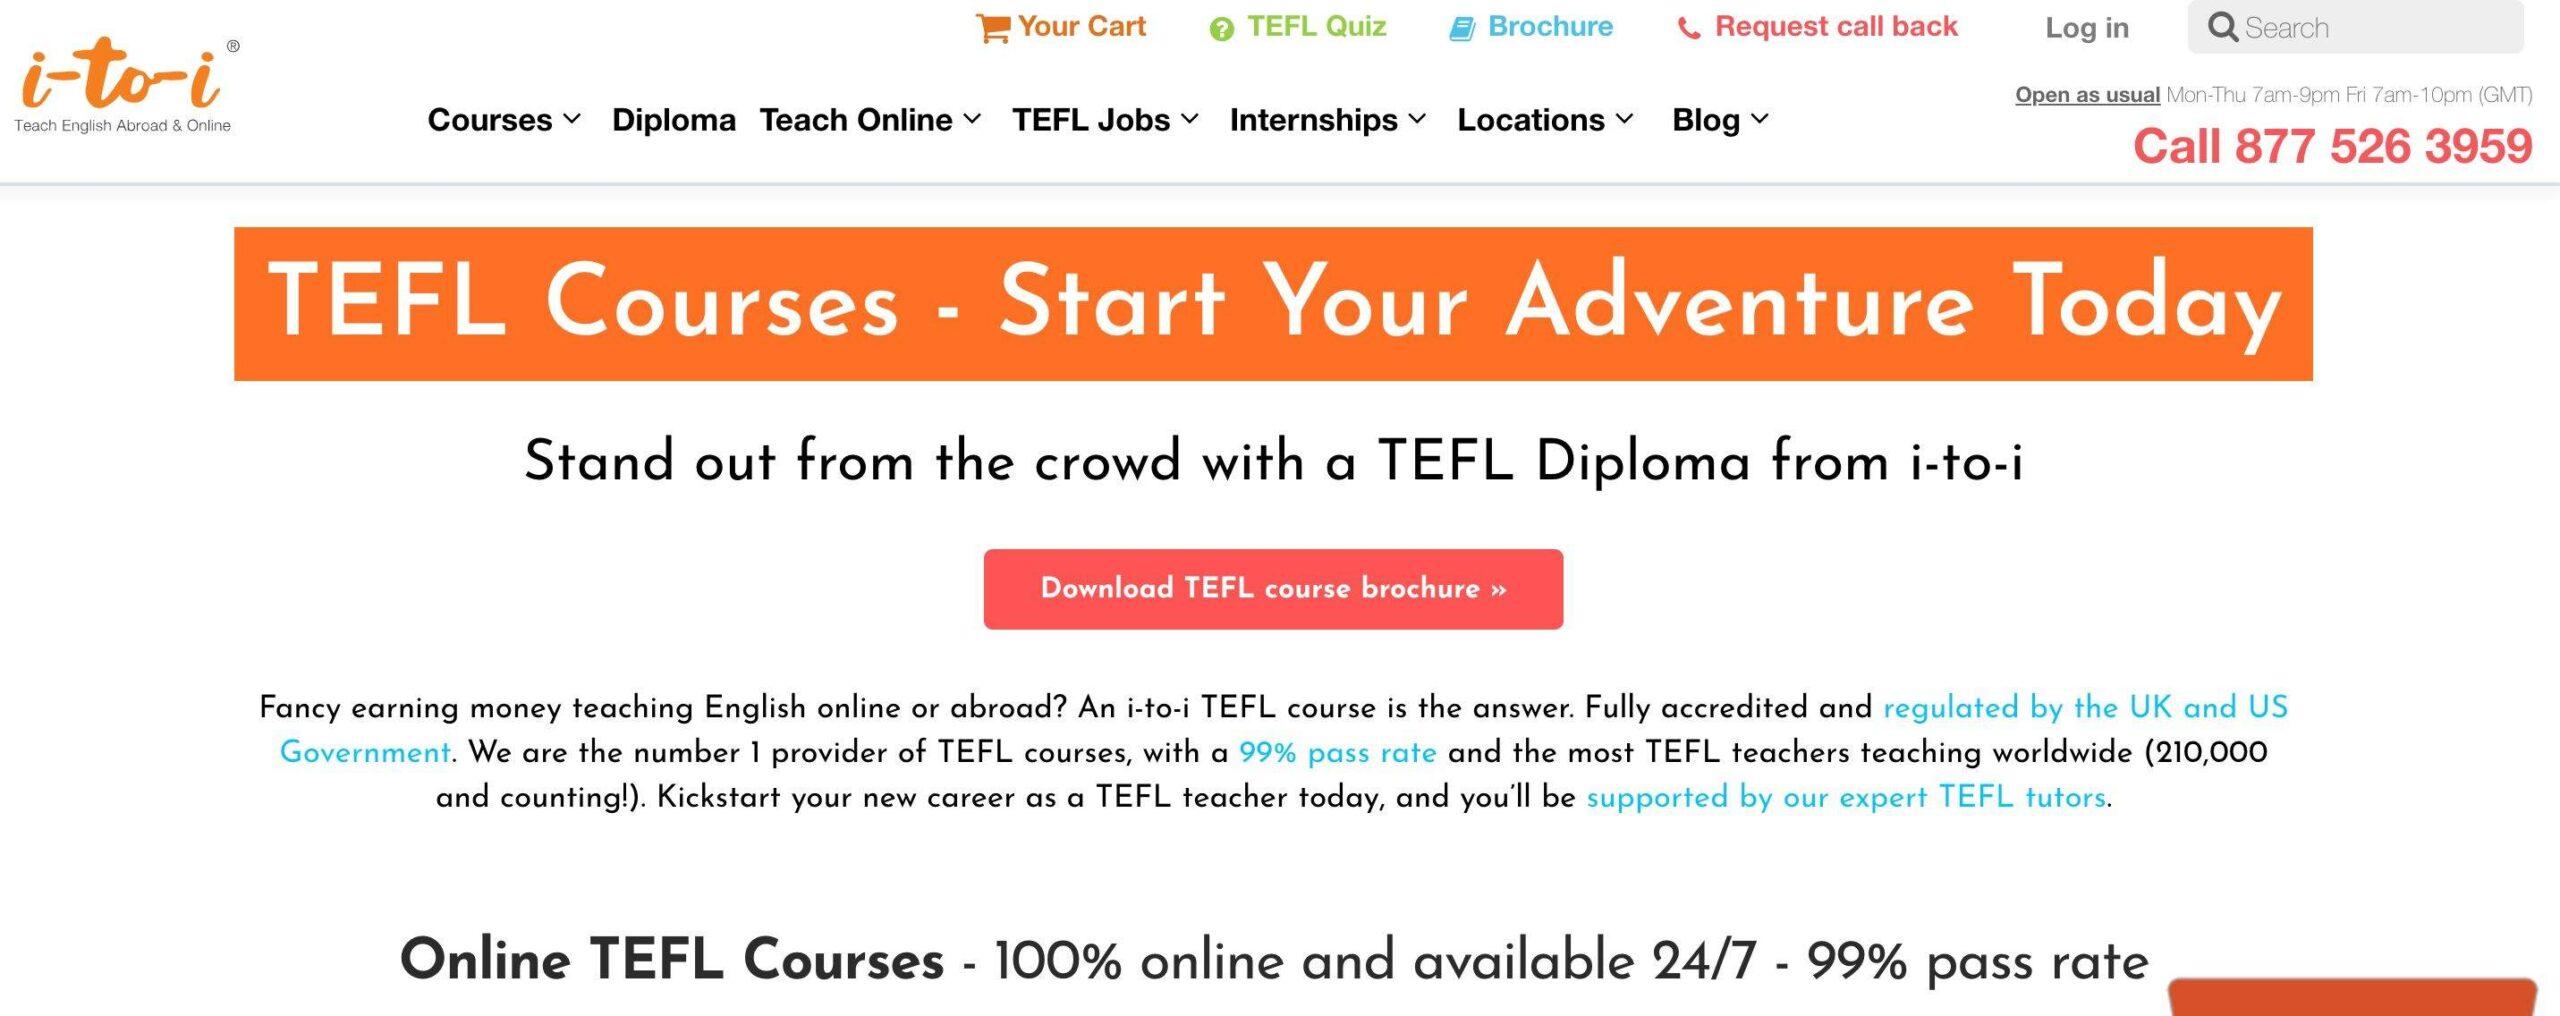 Screenshot of i-to-i TEFL course